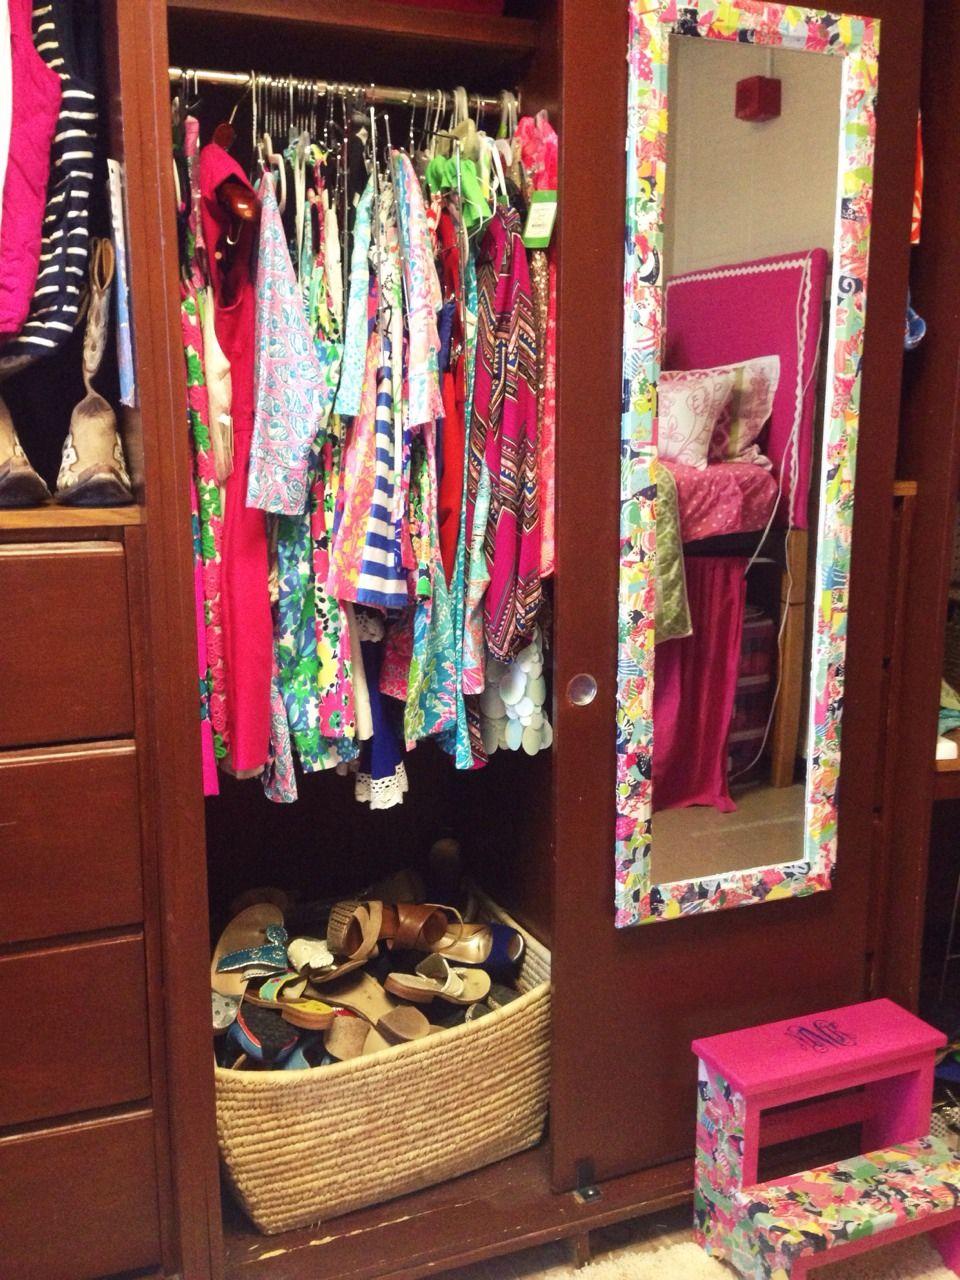 Marvelous Dorm Closet. Like The Shoe Basket!